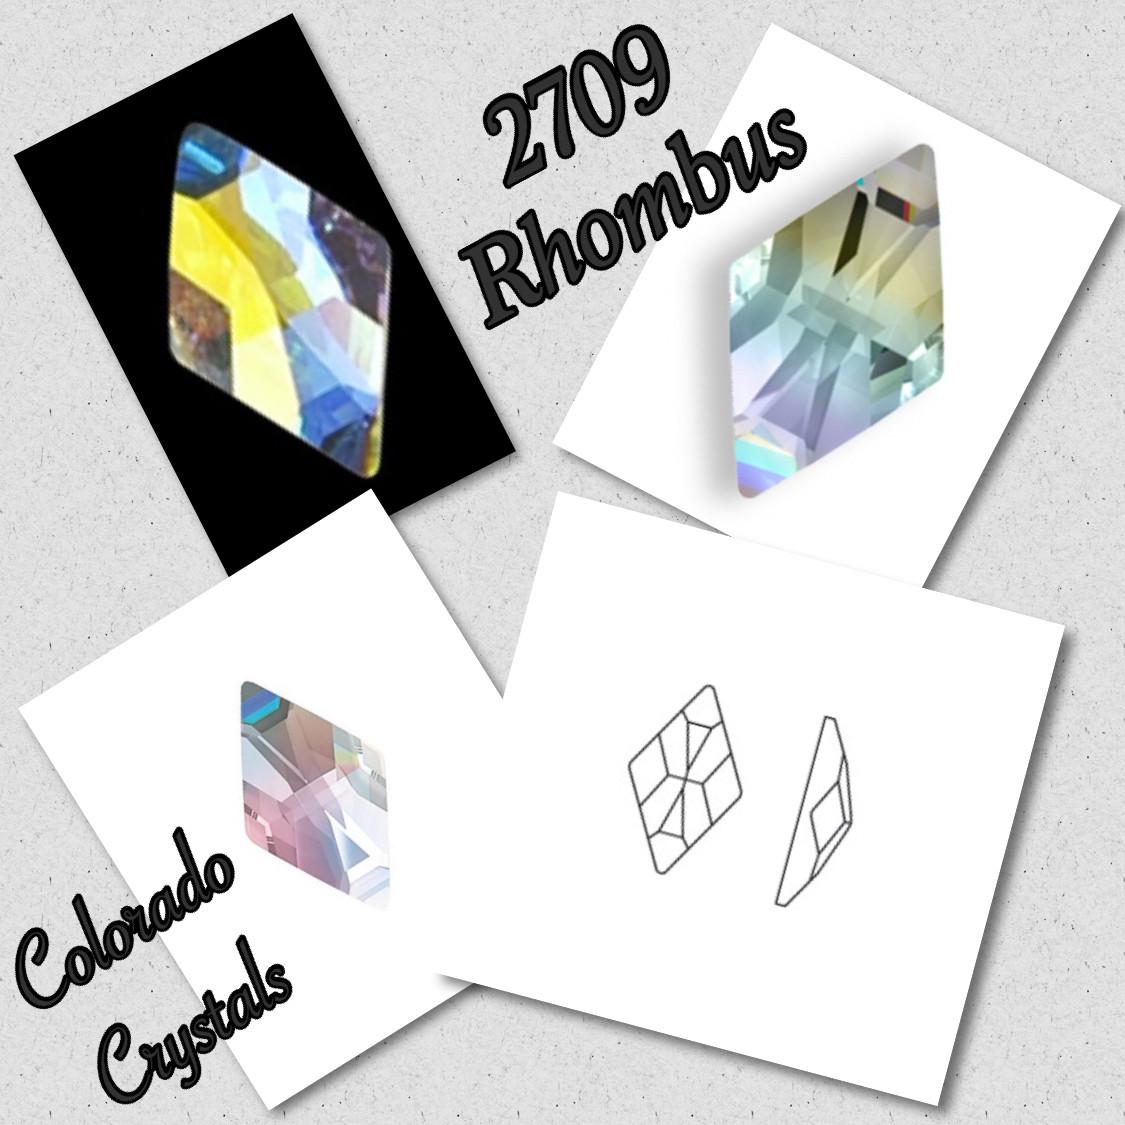 2709 Rhombus 13X8 - Crystal AB - Swarovski Fancy Flatback LIMITED